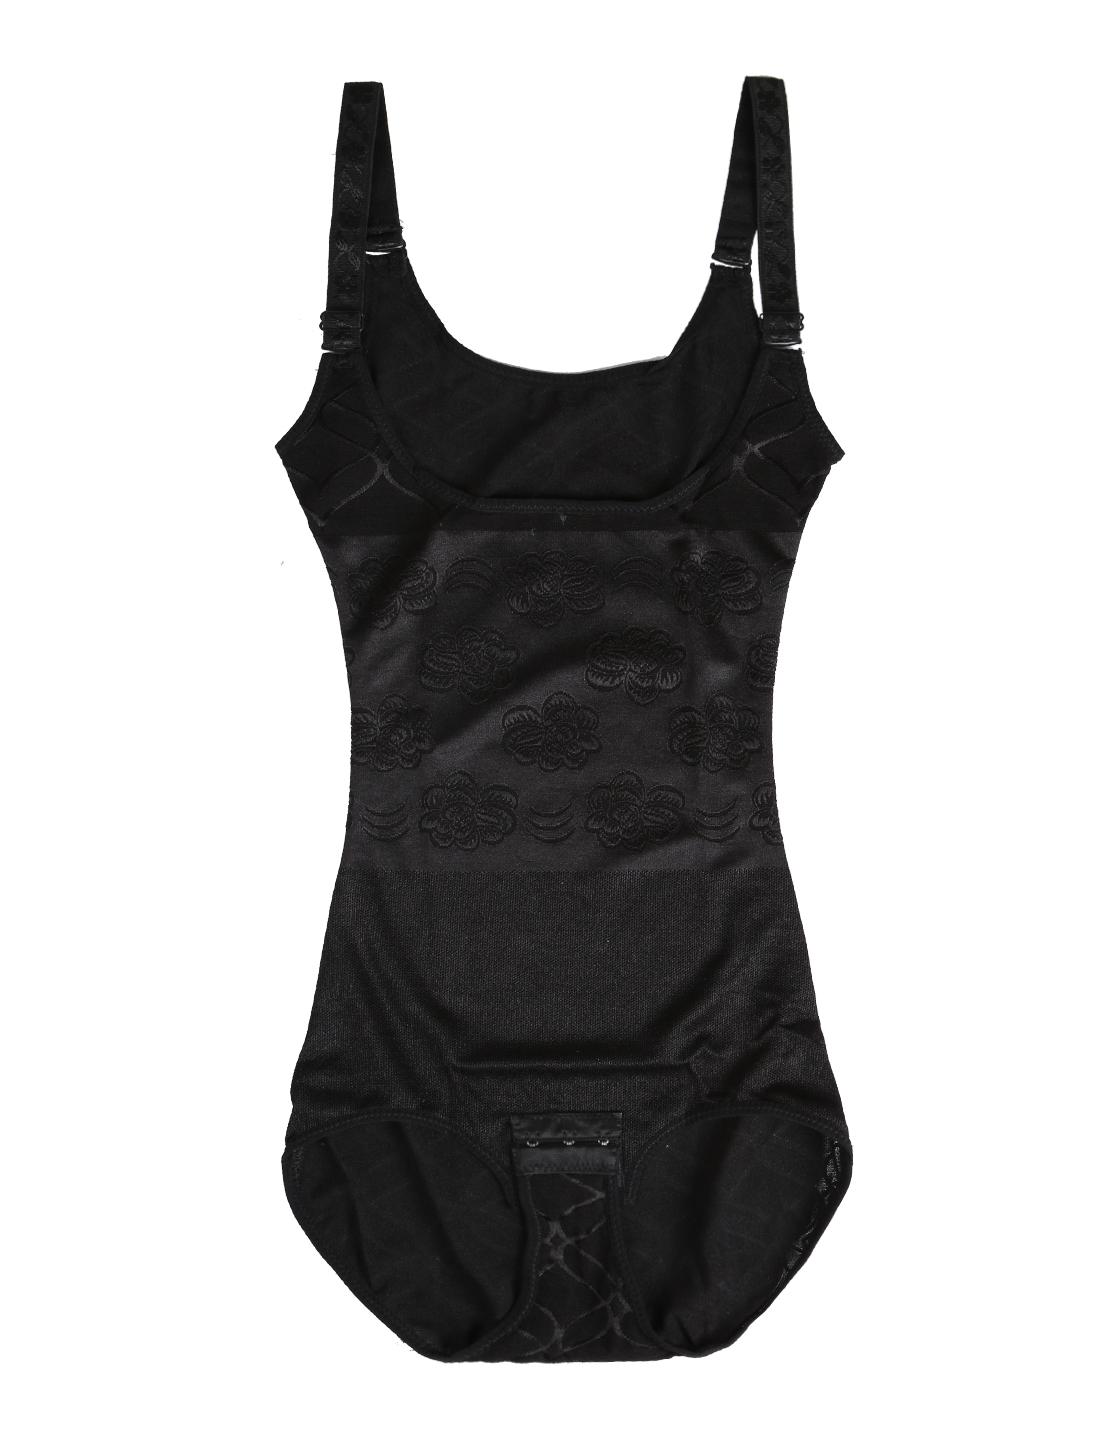 Women Seamless Front U-Style Open Bust Firm Control Shapewear Black Medium